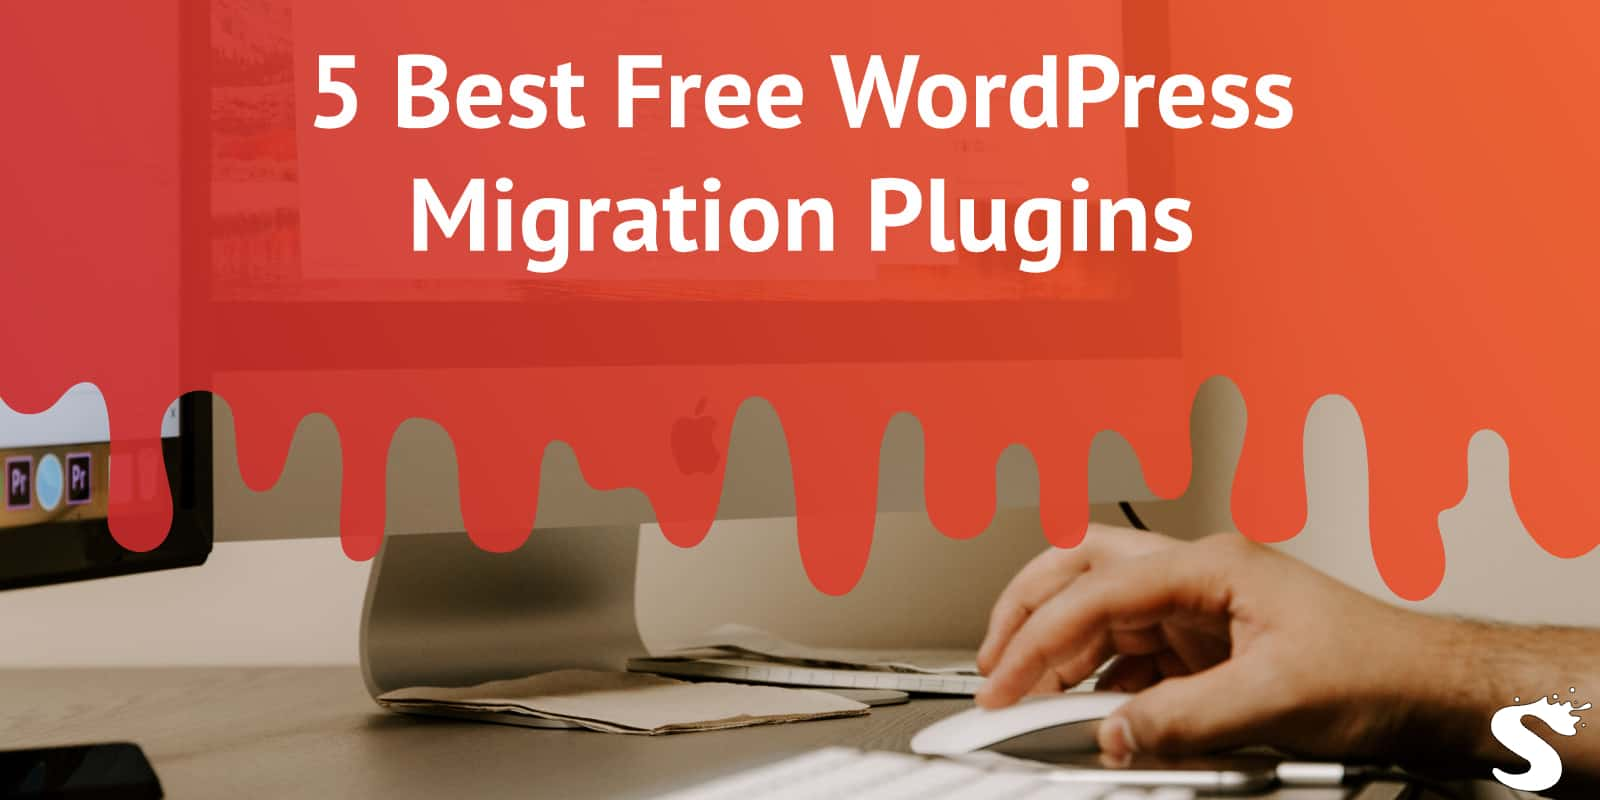 5 Best Free WordPress Migration Plugins